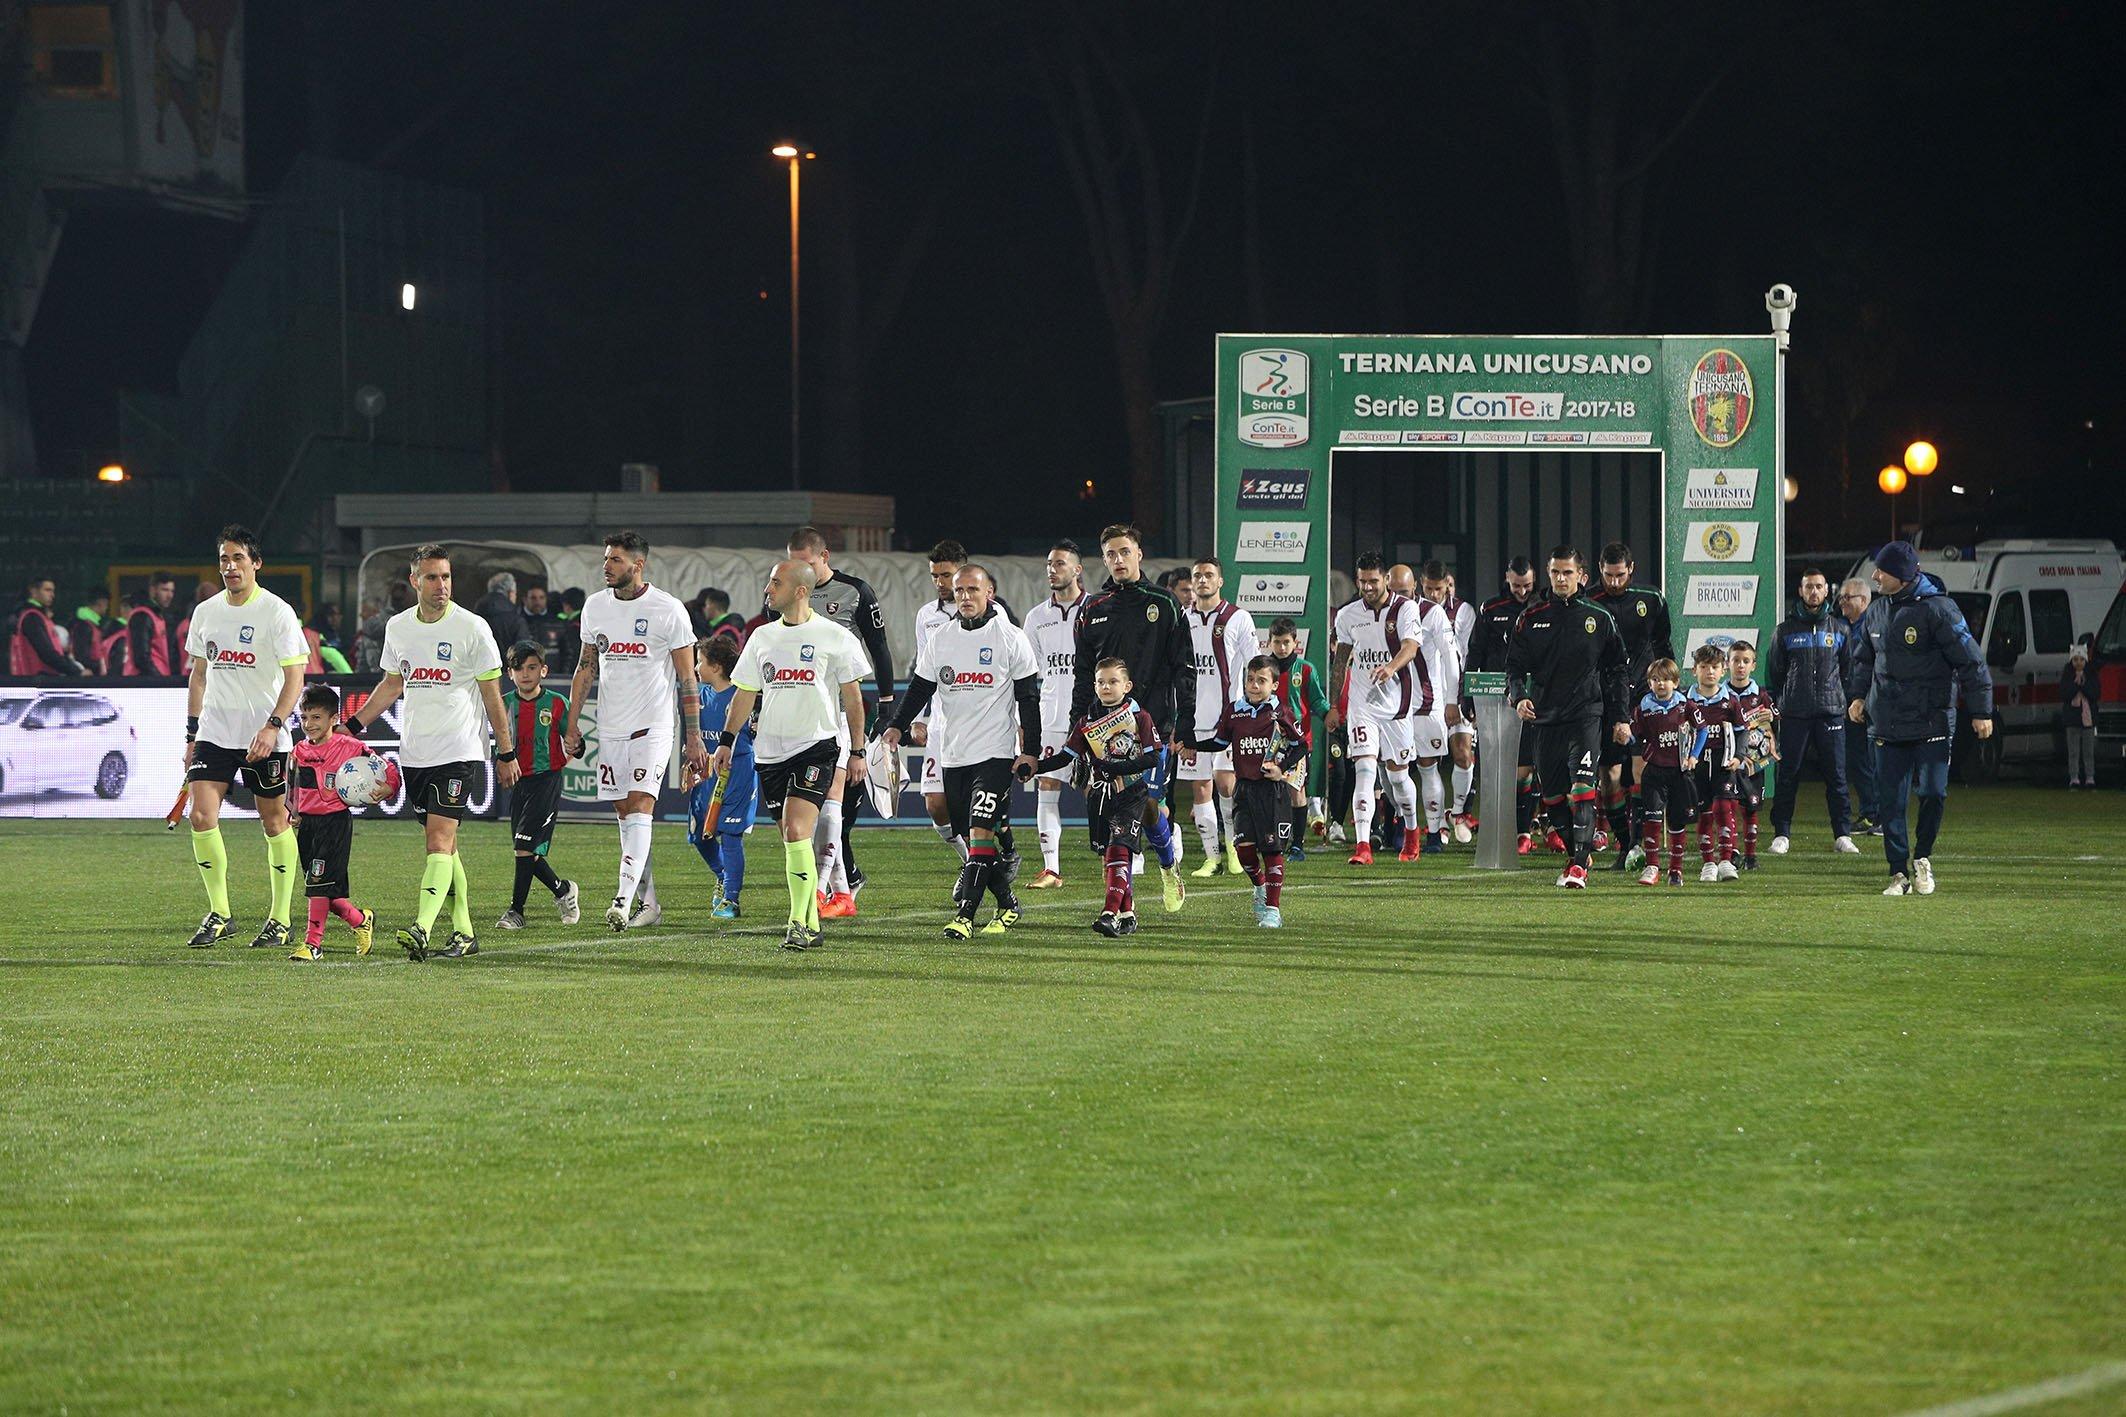 Ternana-Salernitana 2-2, pareggio rossoverde nel finale